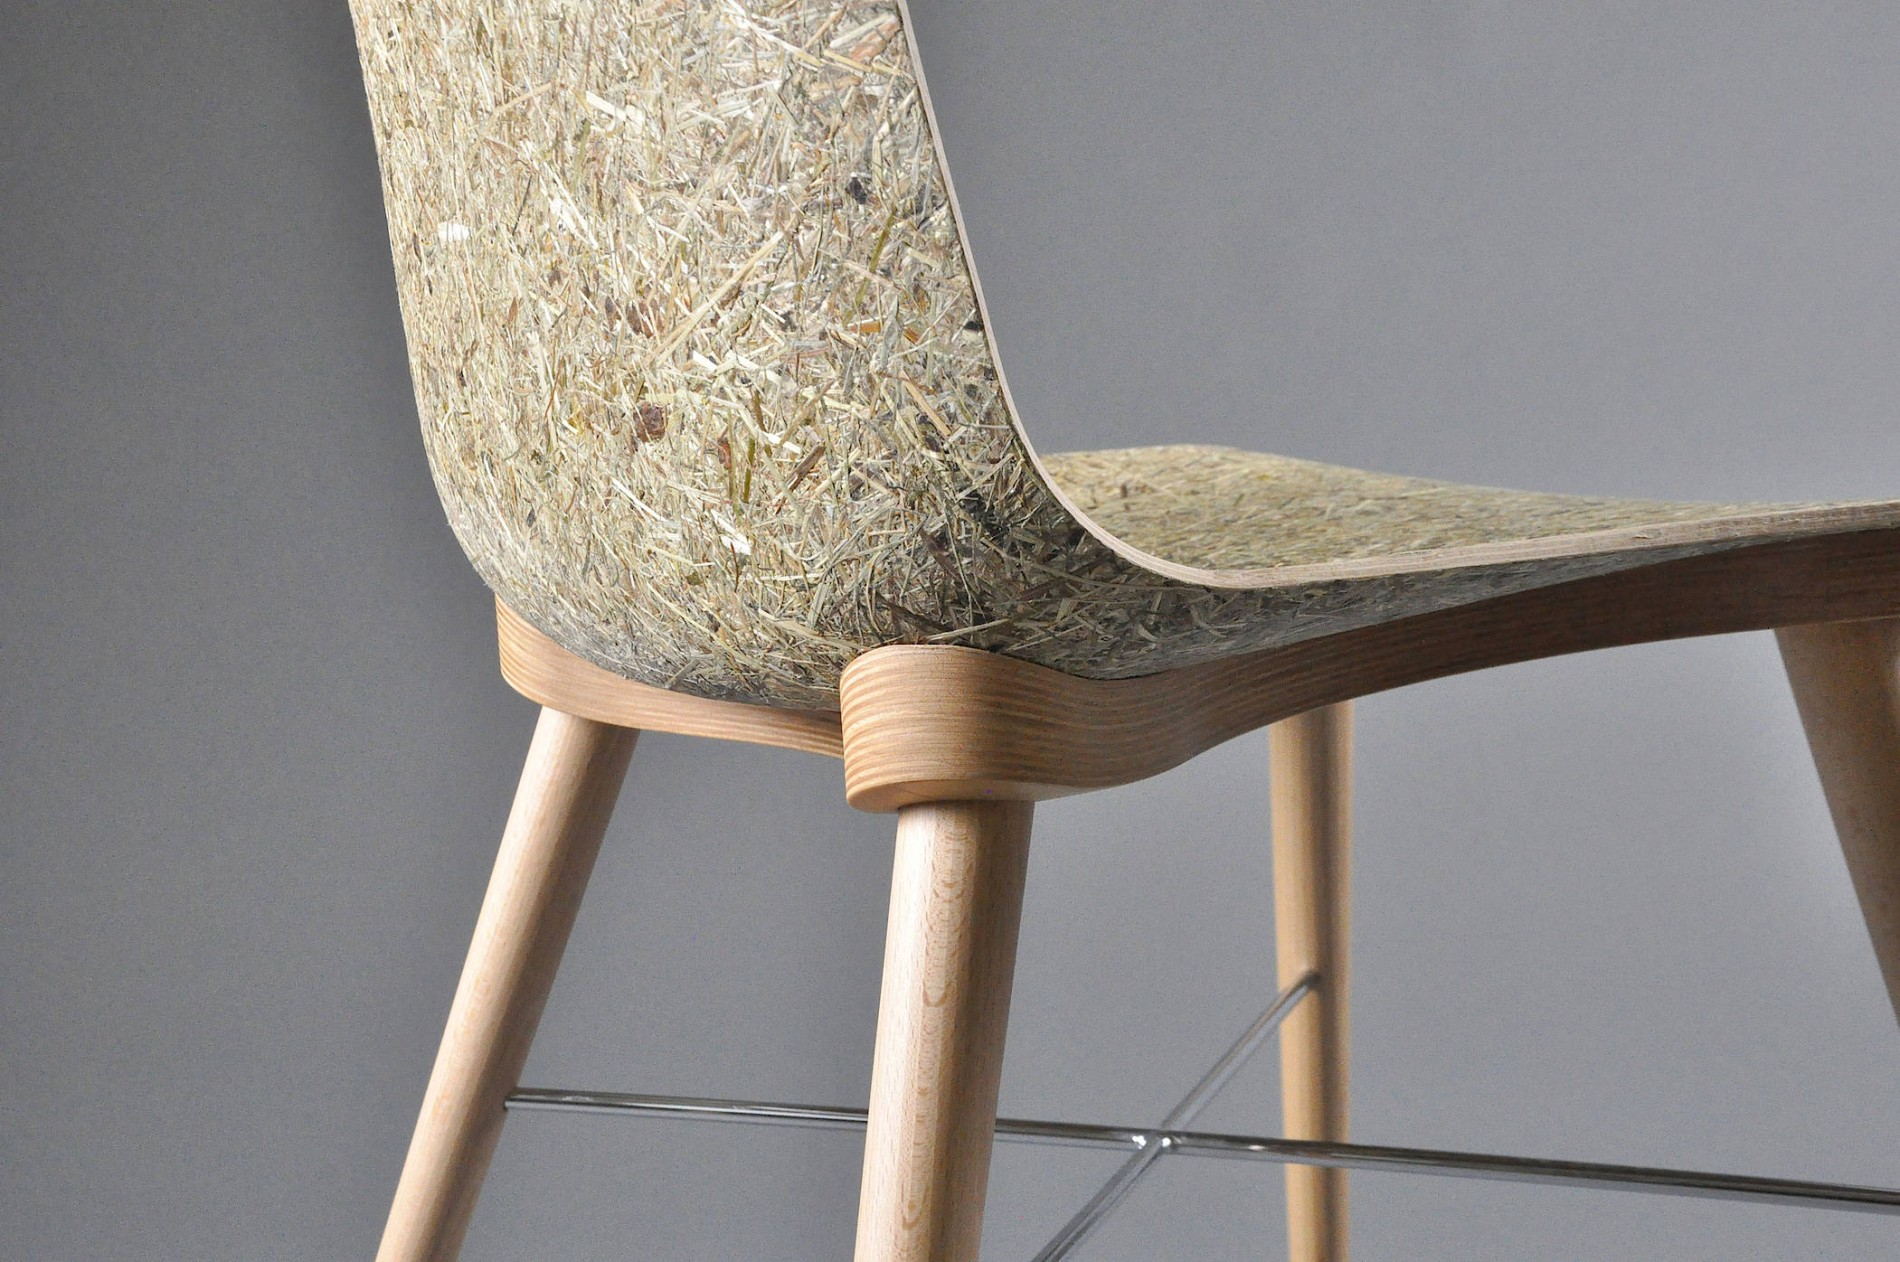 Pilz Möbel Möbel Aus NaturmaterialienVom Erleuchtet UqSMVpGz